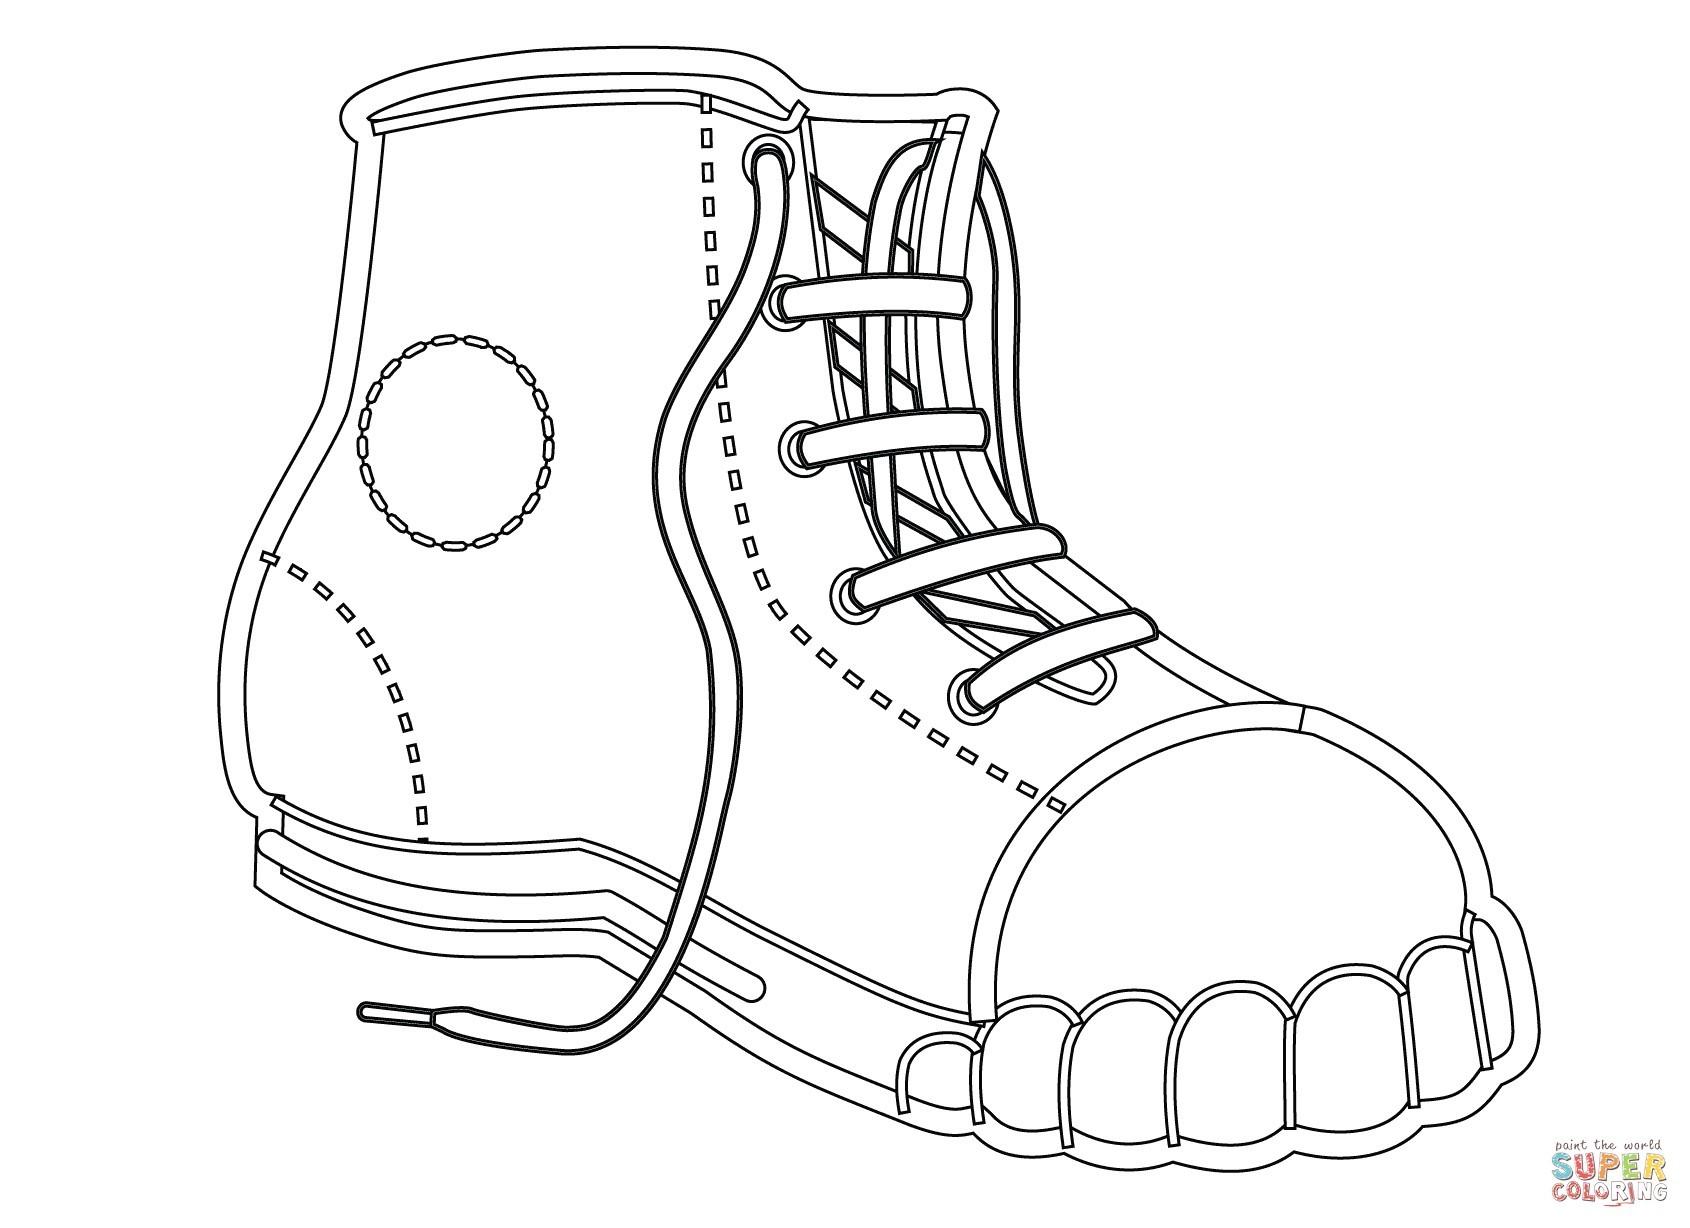 1690x1228 Coloring Pages Of Kd Shoes Copy Air Jordan Coloring Pages